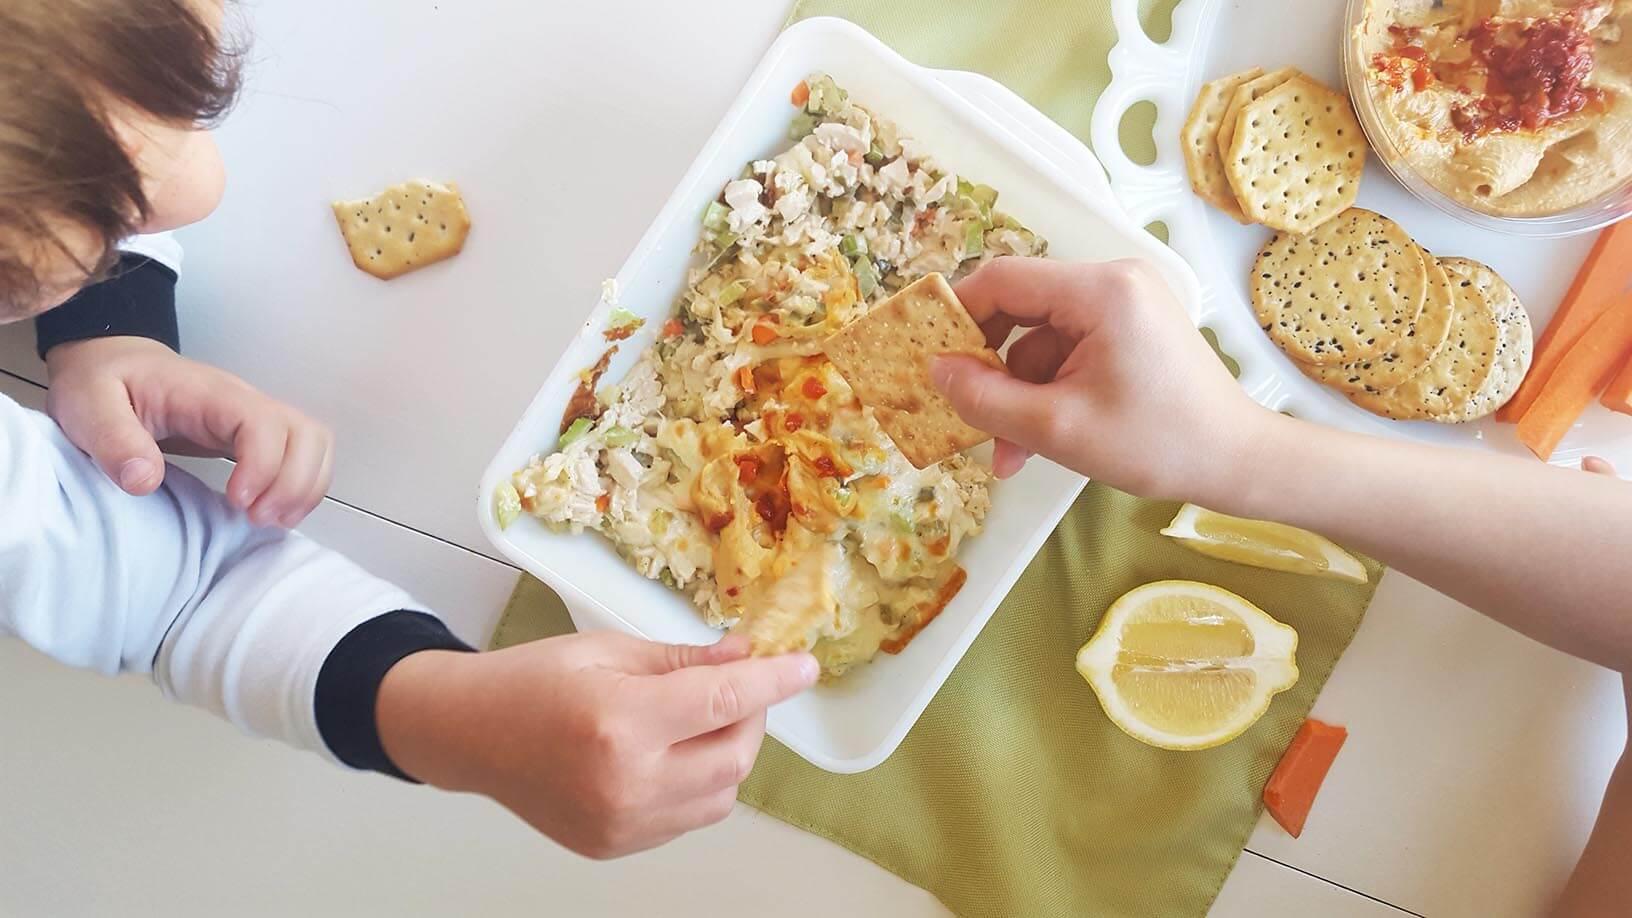 baked sabra hummus chicken salad